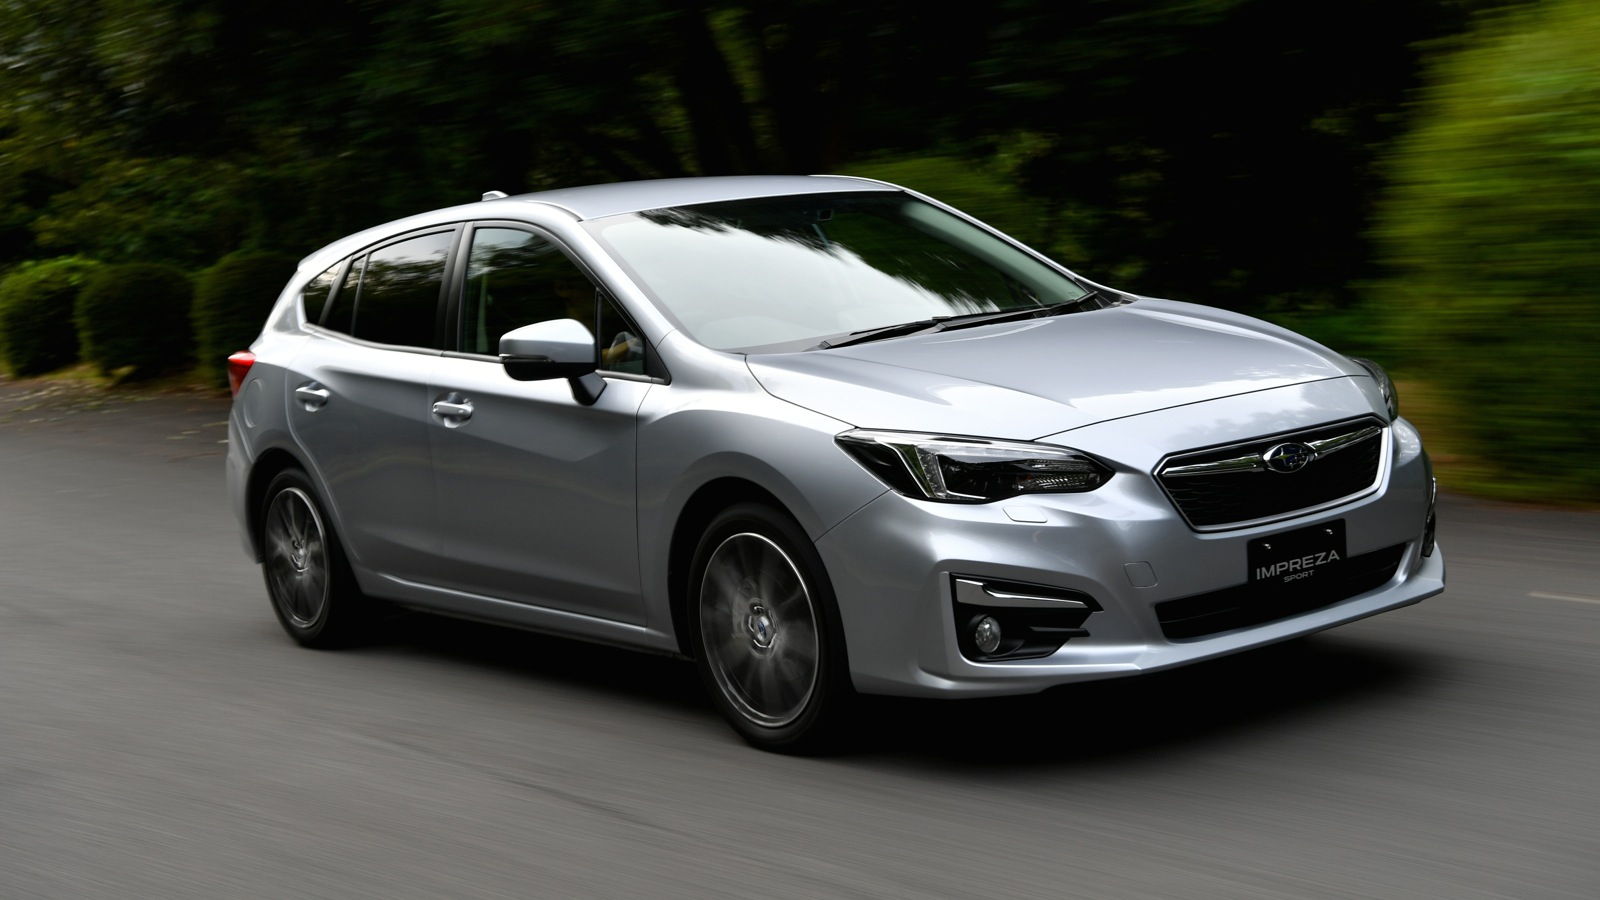 2017 Mazda3 Hatchback >> 2017 Subaru Impreza Review | CarAdvice